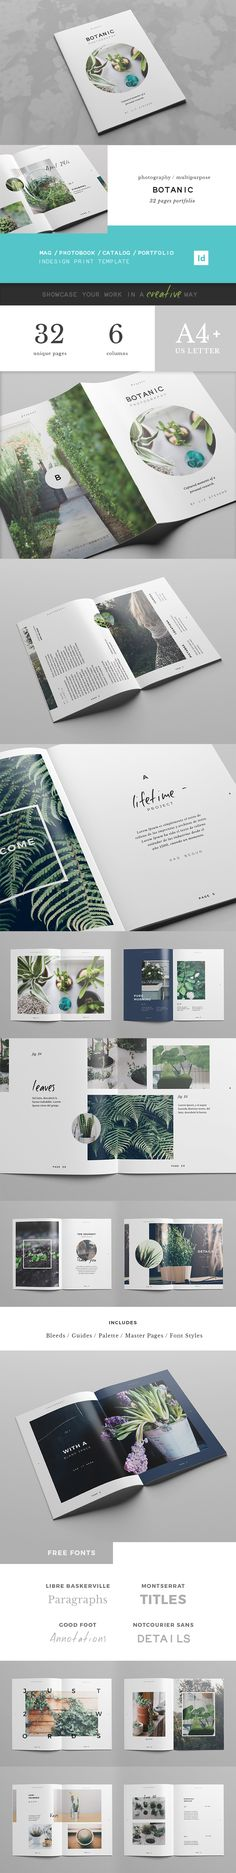 Botanic Portfolio Template on Behance